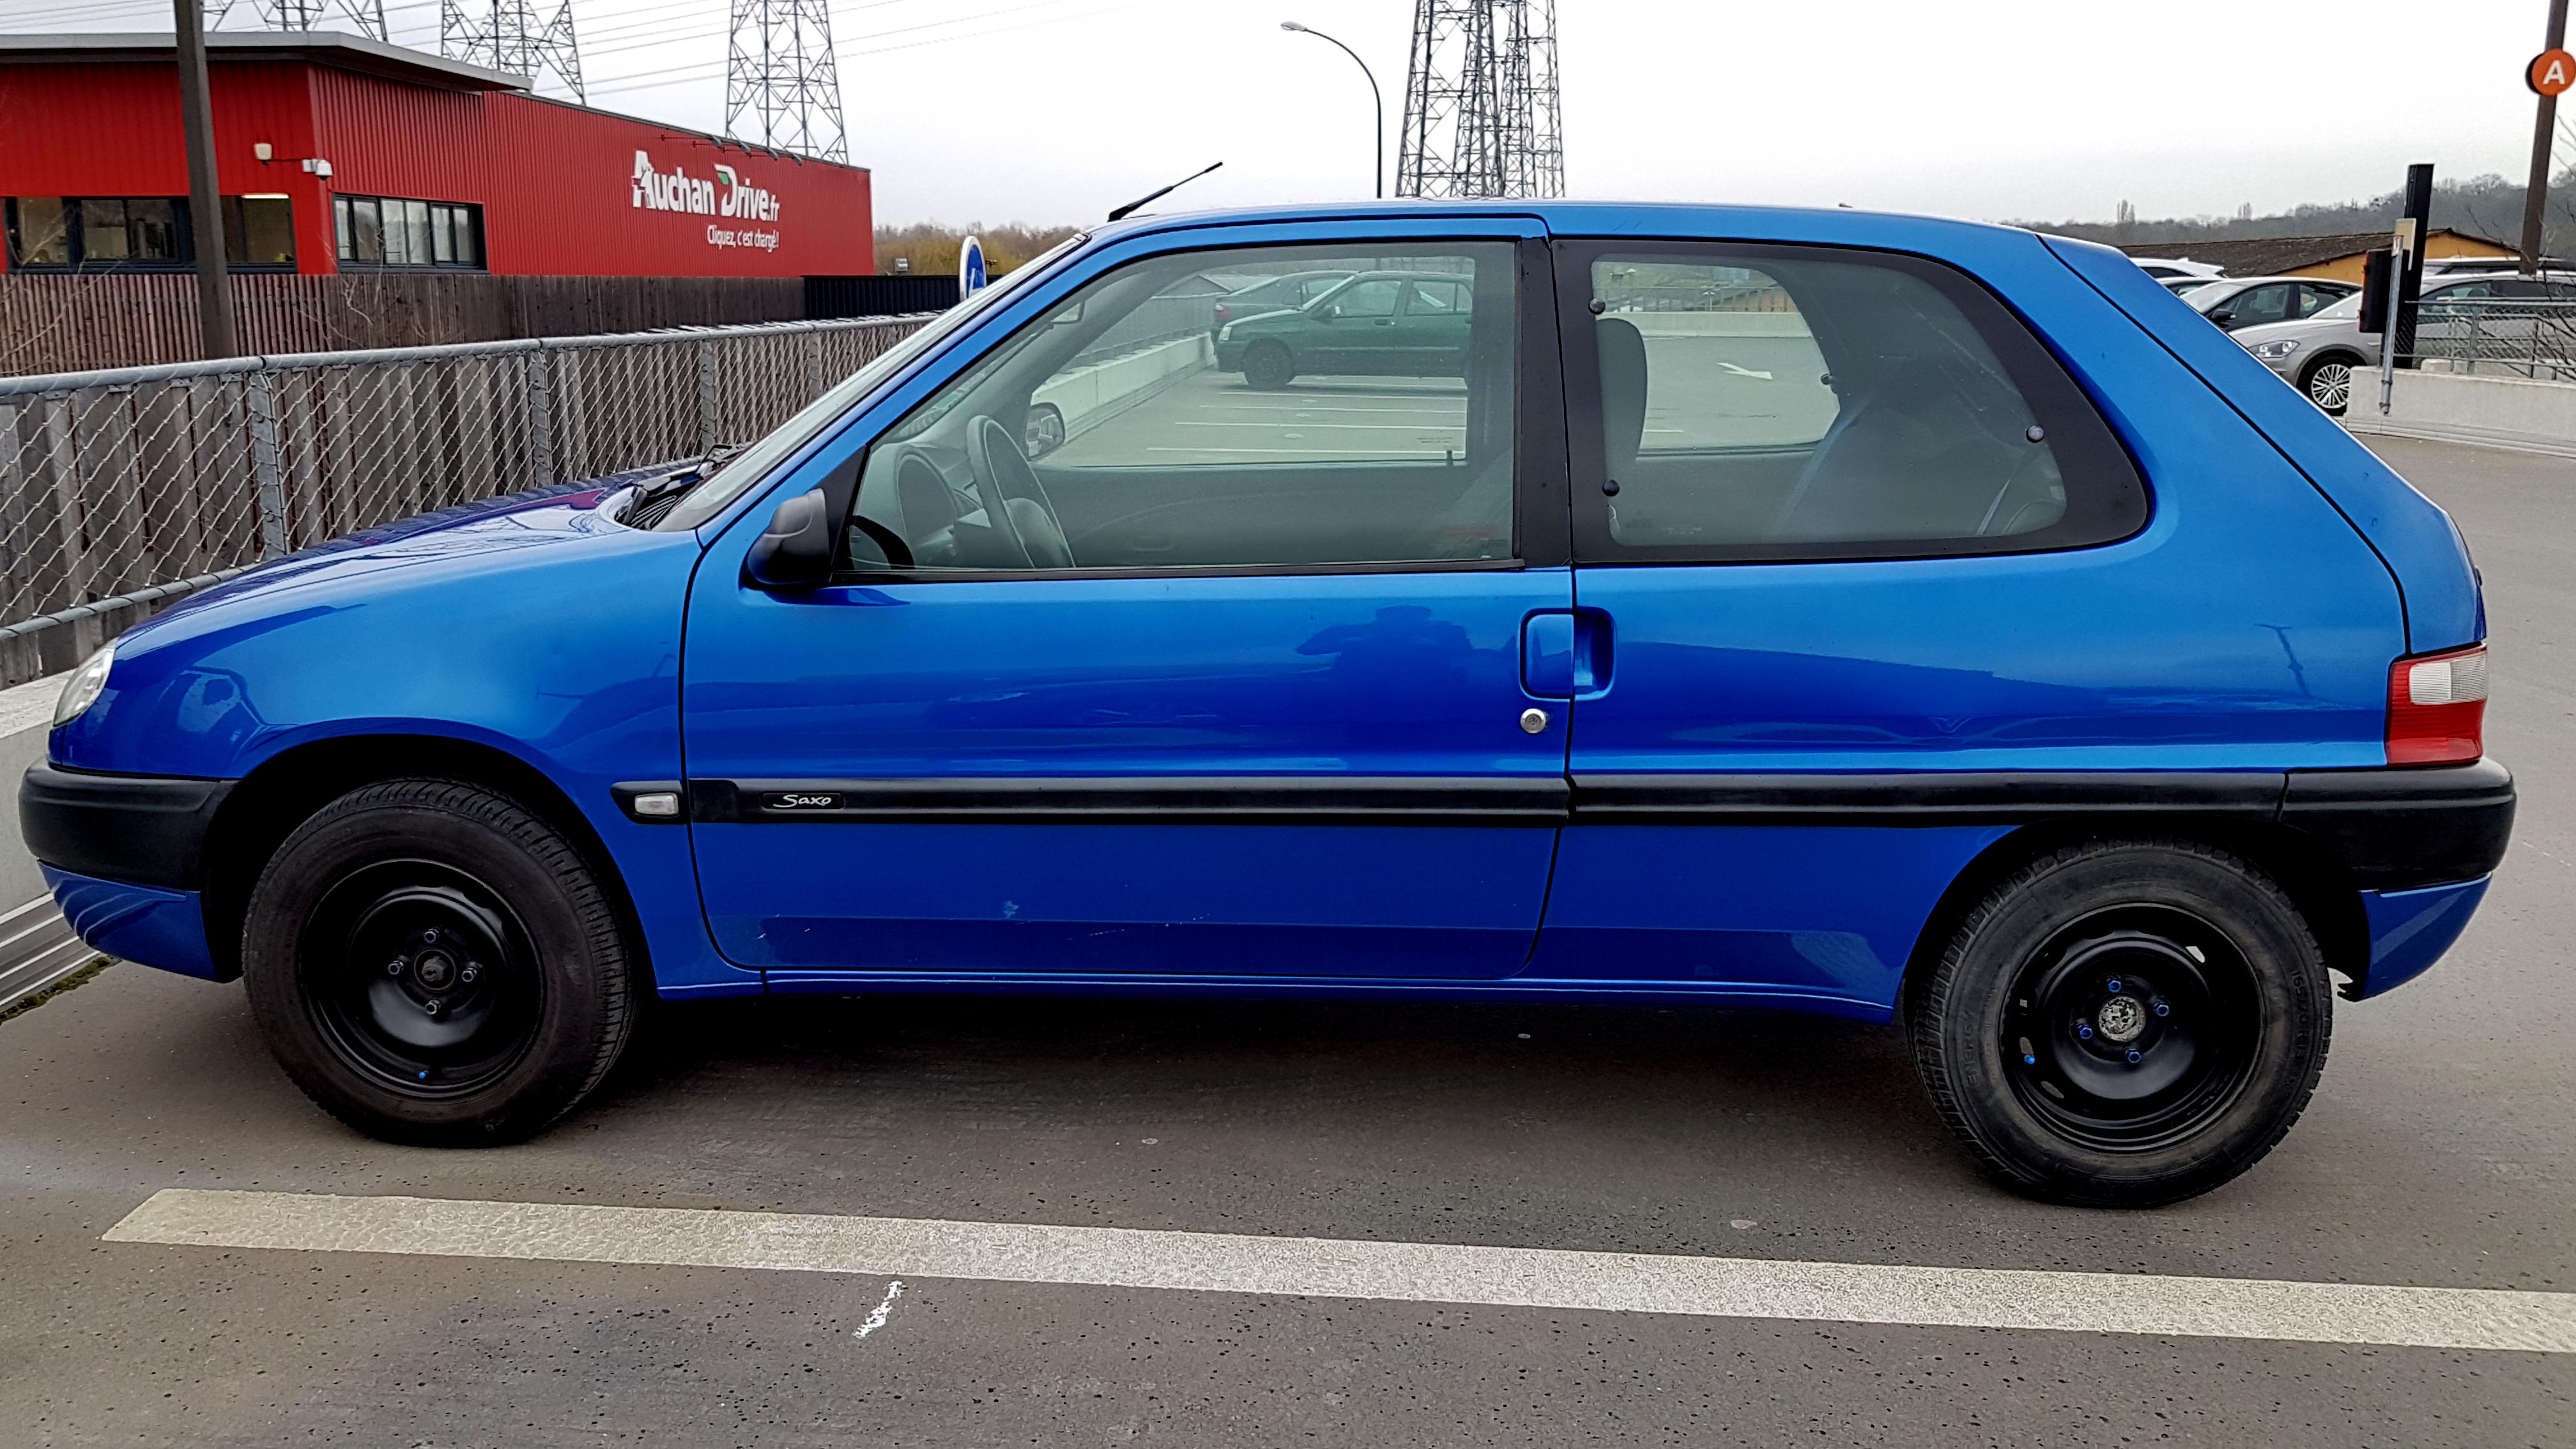 citroen_saxo_exterieur_3 Citroën saxo porte pneu vitre custode